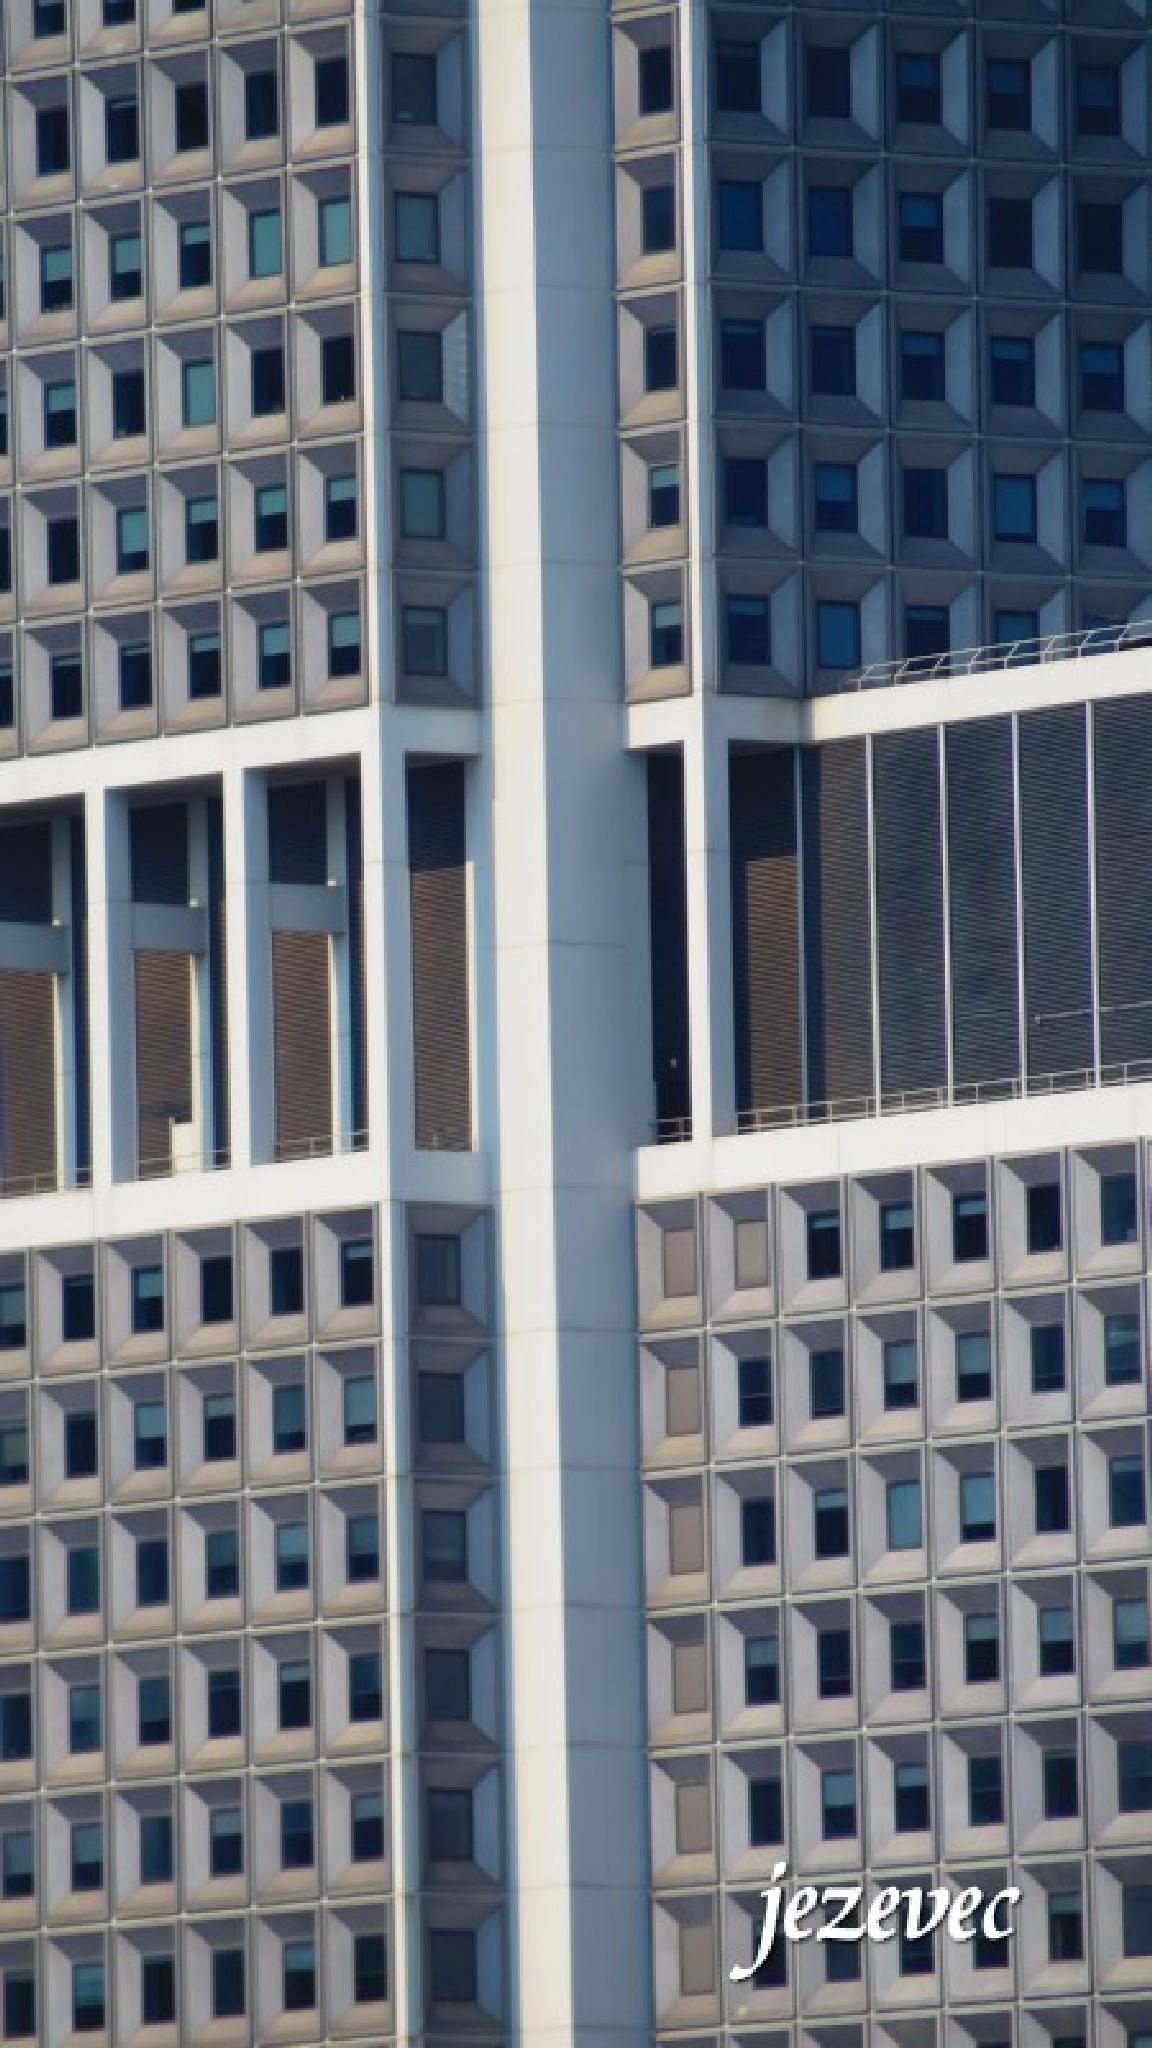 New York skyscraper 2014-07-20 0687 by jezevec40